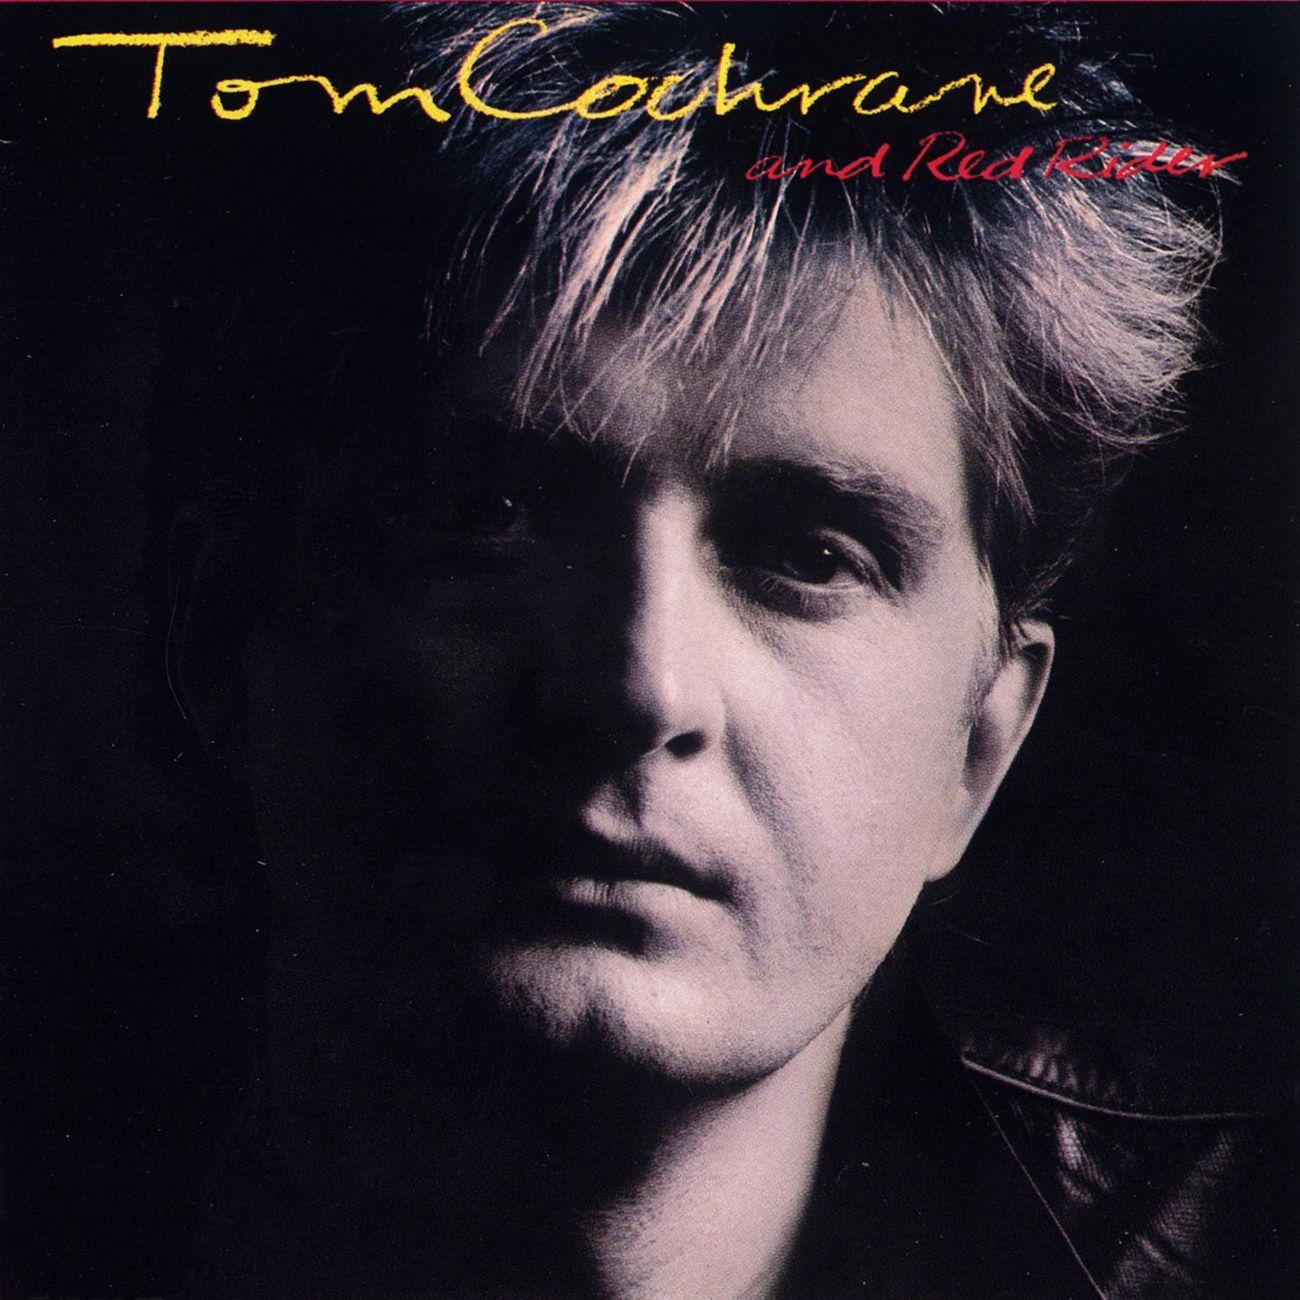 tom cochrane lunatic fringe lyricsListen to songs from the album Tom Cochrane And Red Rider of the nKLFZlOI